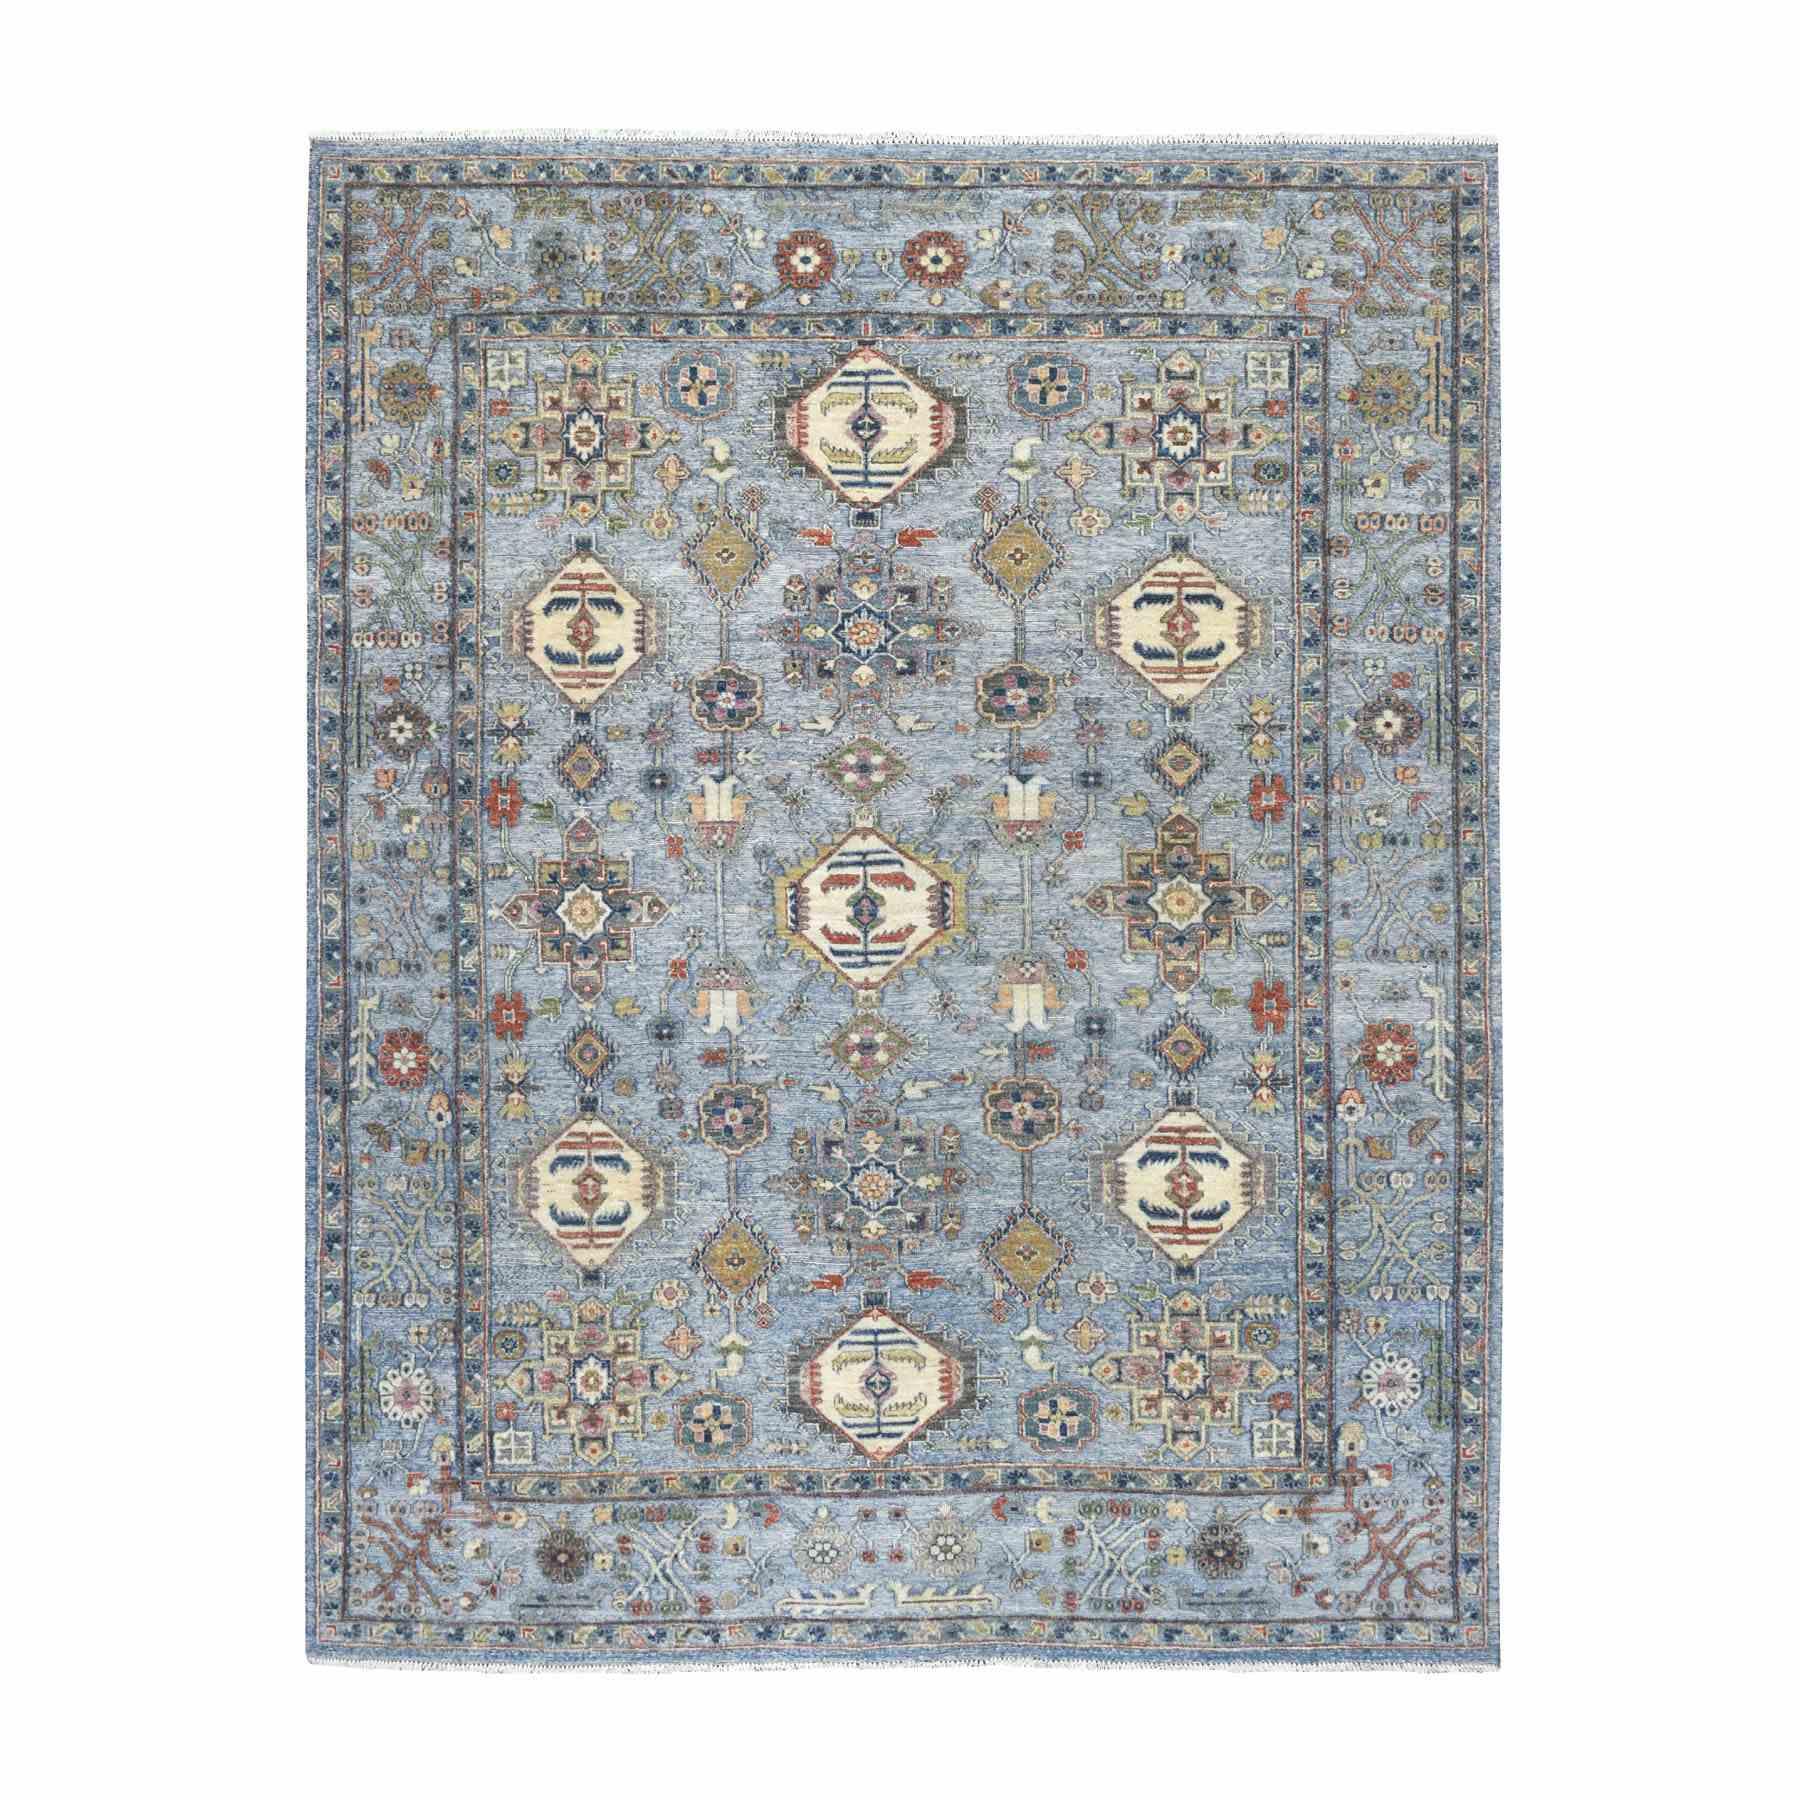 "7'9""X9'9"" Blue Peshawar With Karajeh Design Organic Textured Wool Hand Knotted Oriental Rug moaeea99"